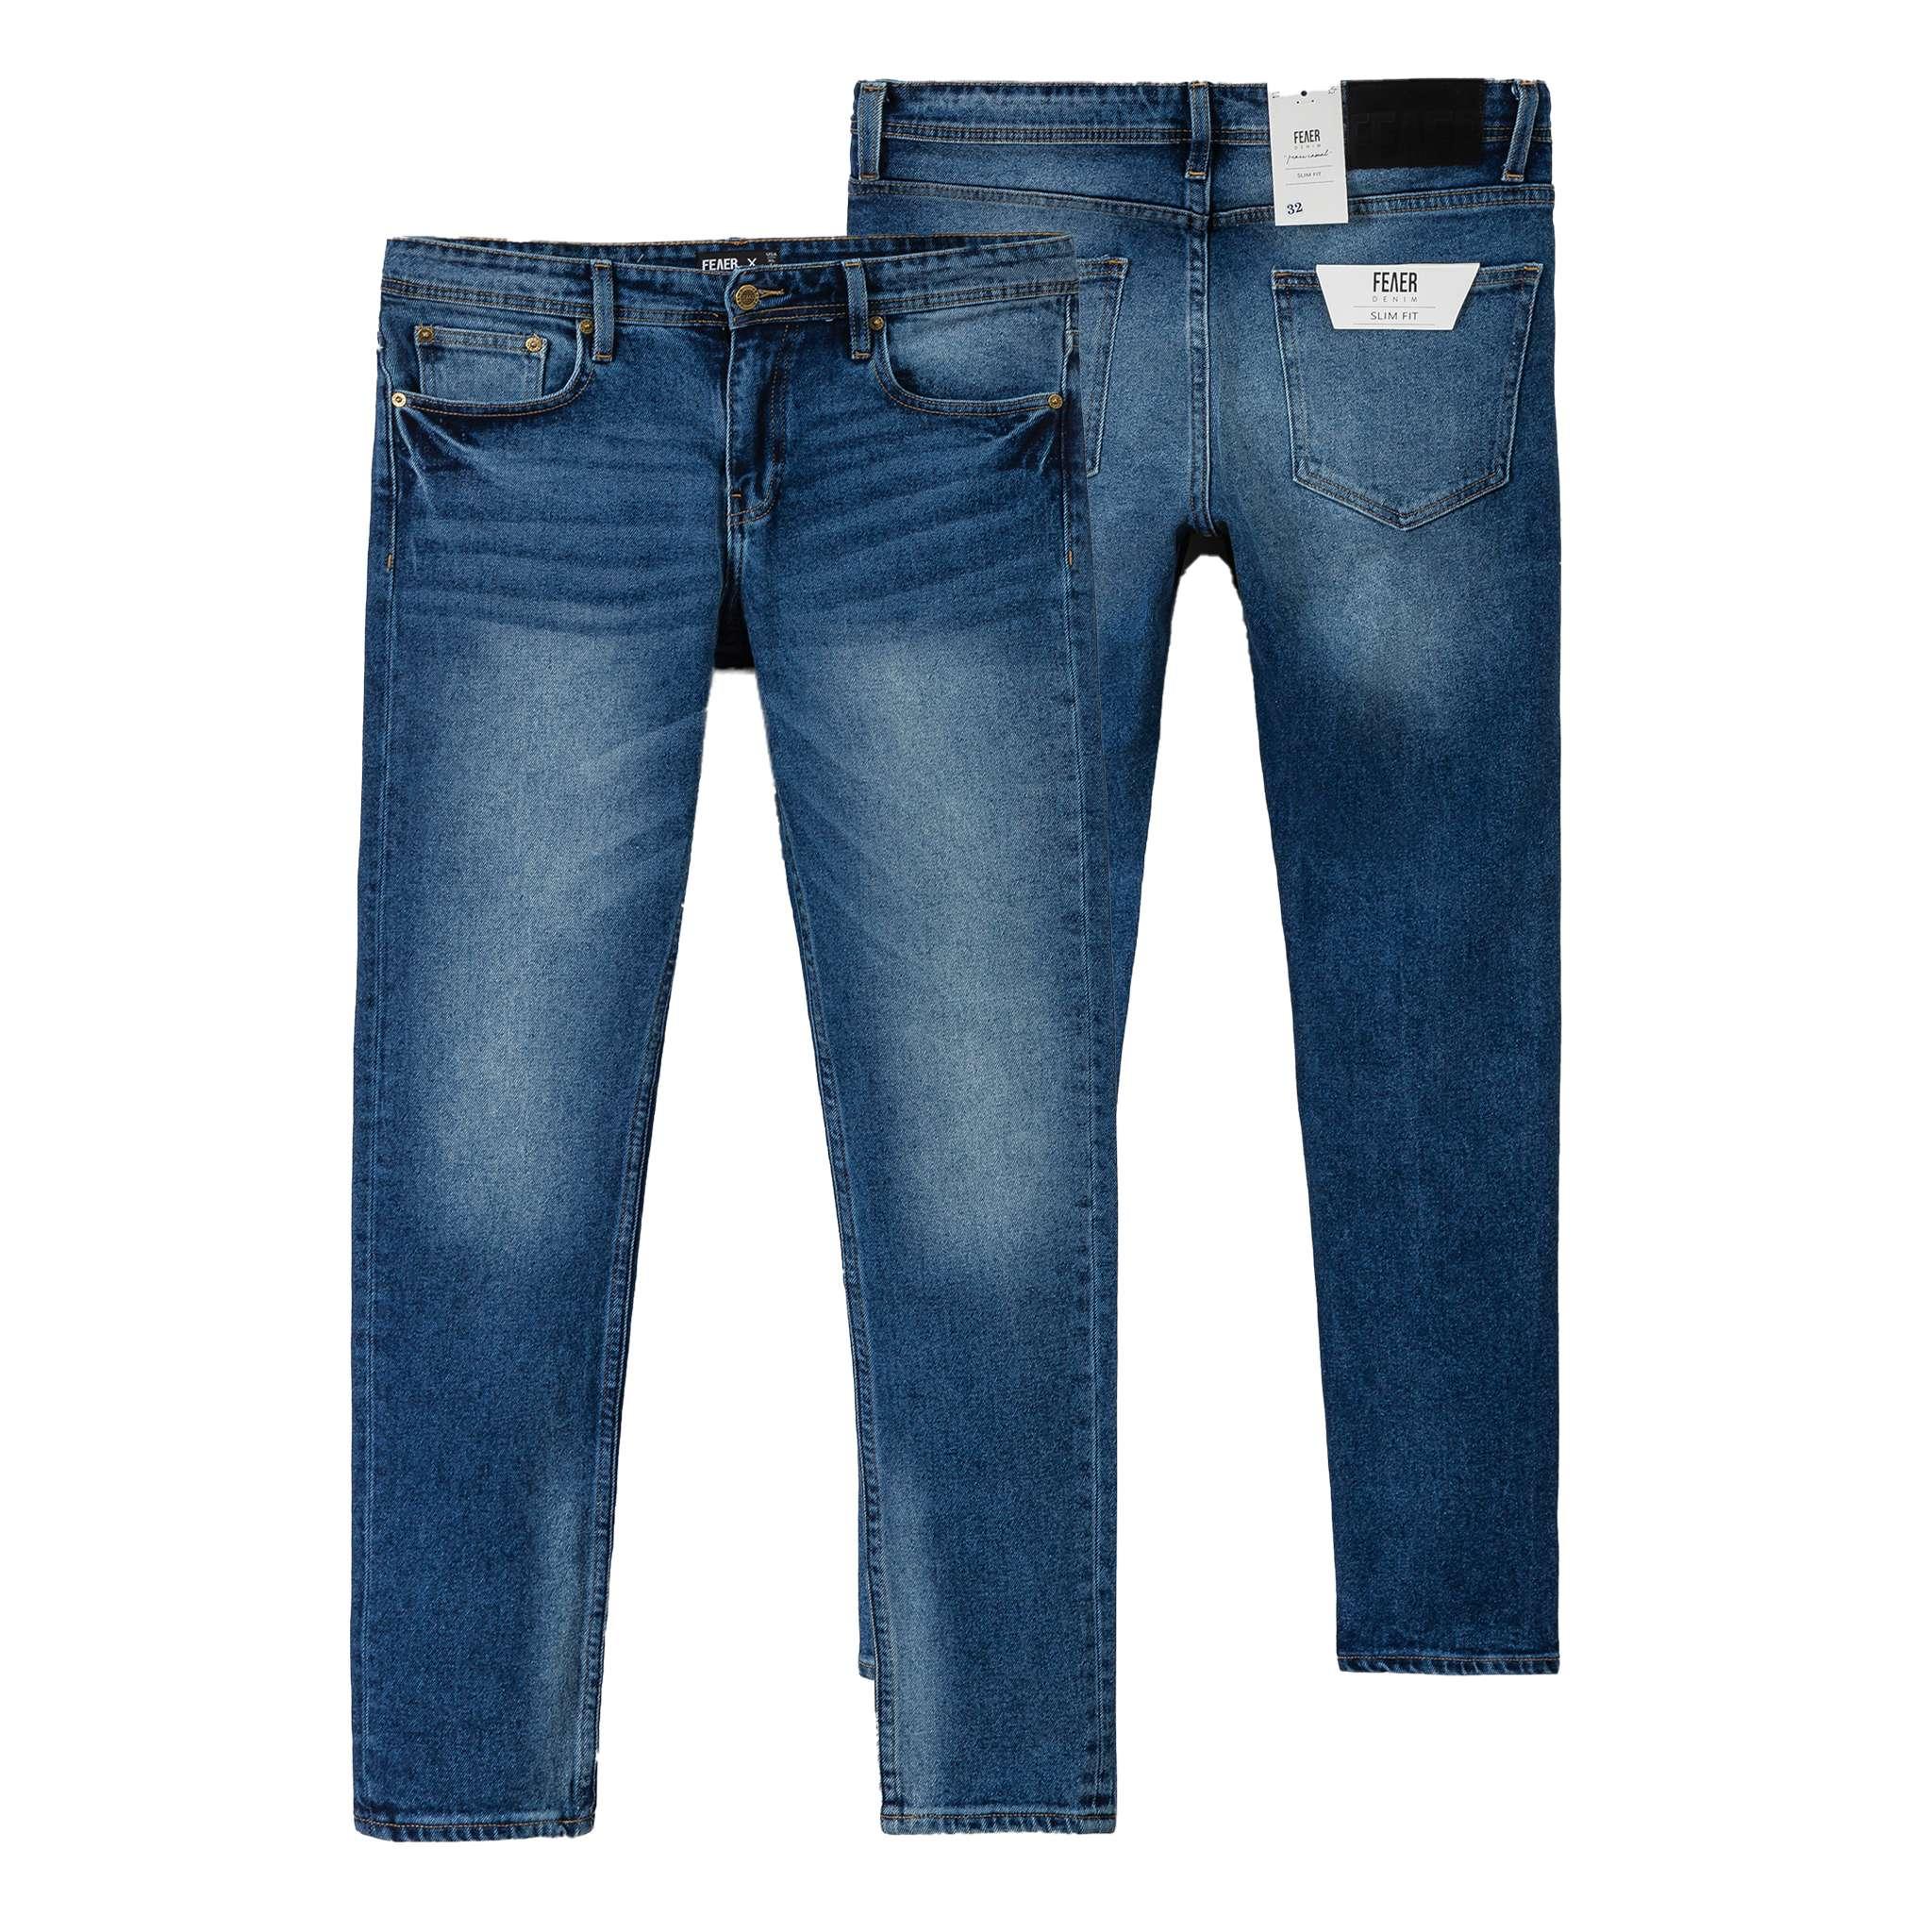 SP225 - Quần Jeans Skinny Dark-Blue